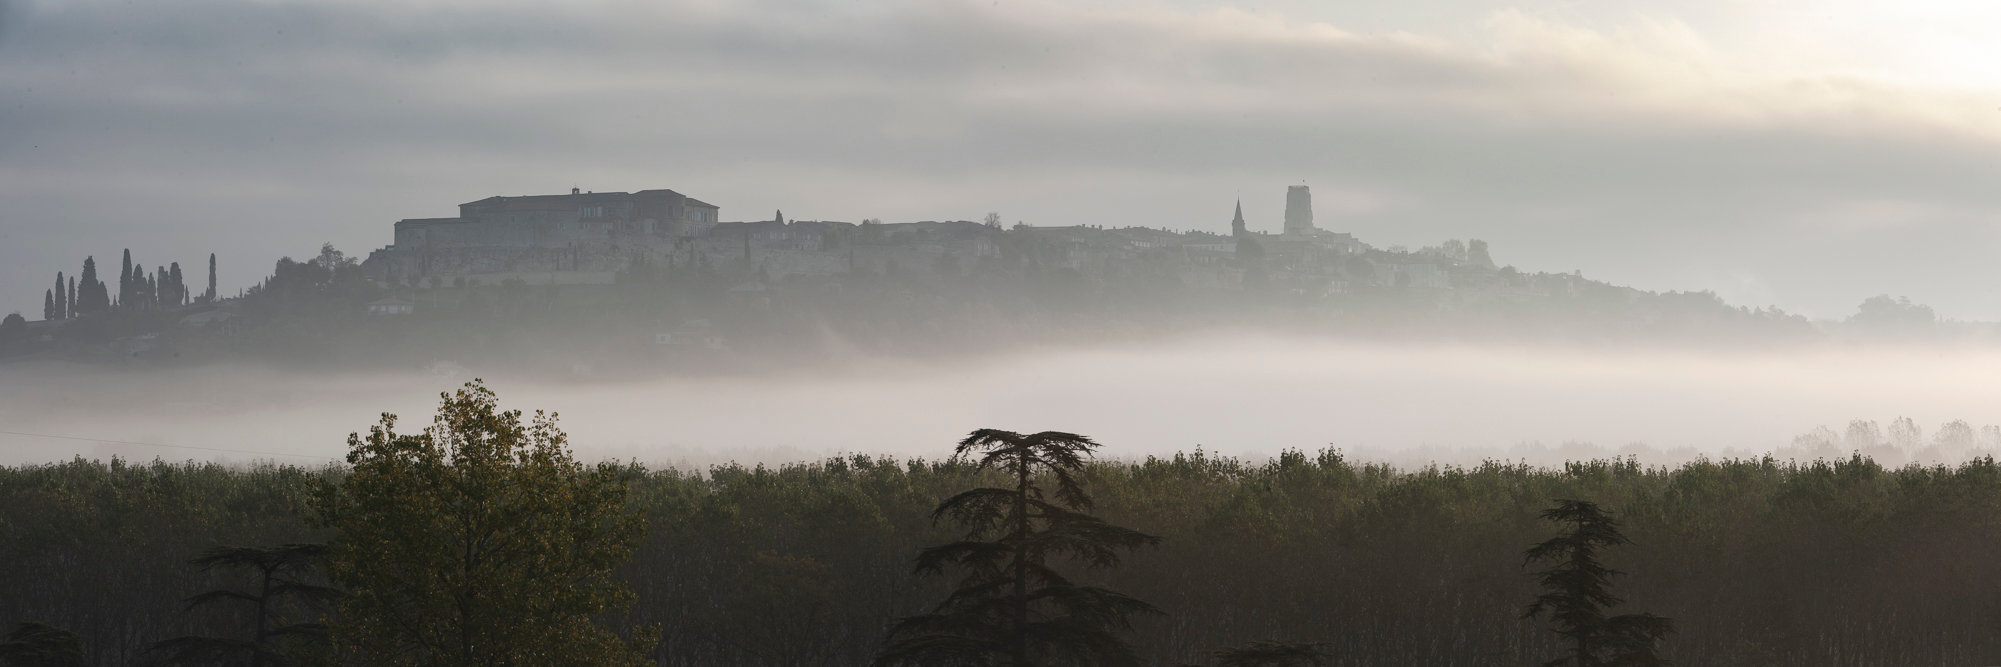 071016_MG_3897-Panorama.jpg